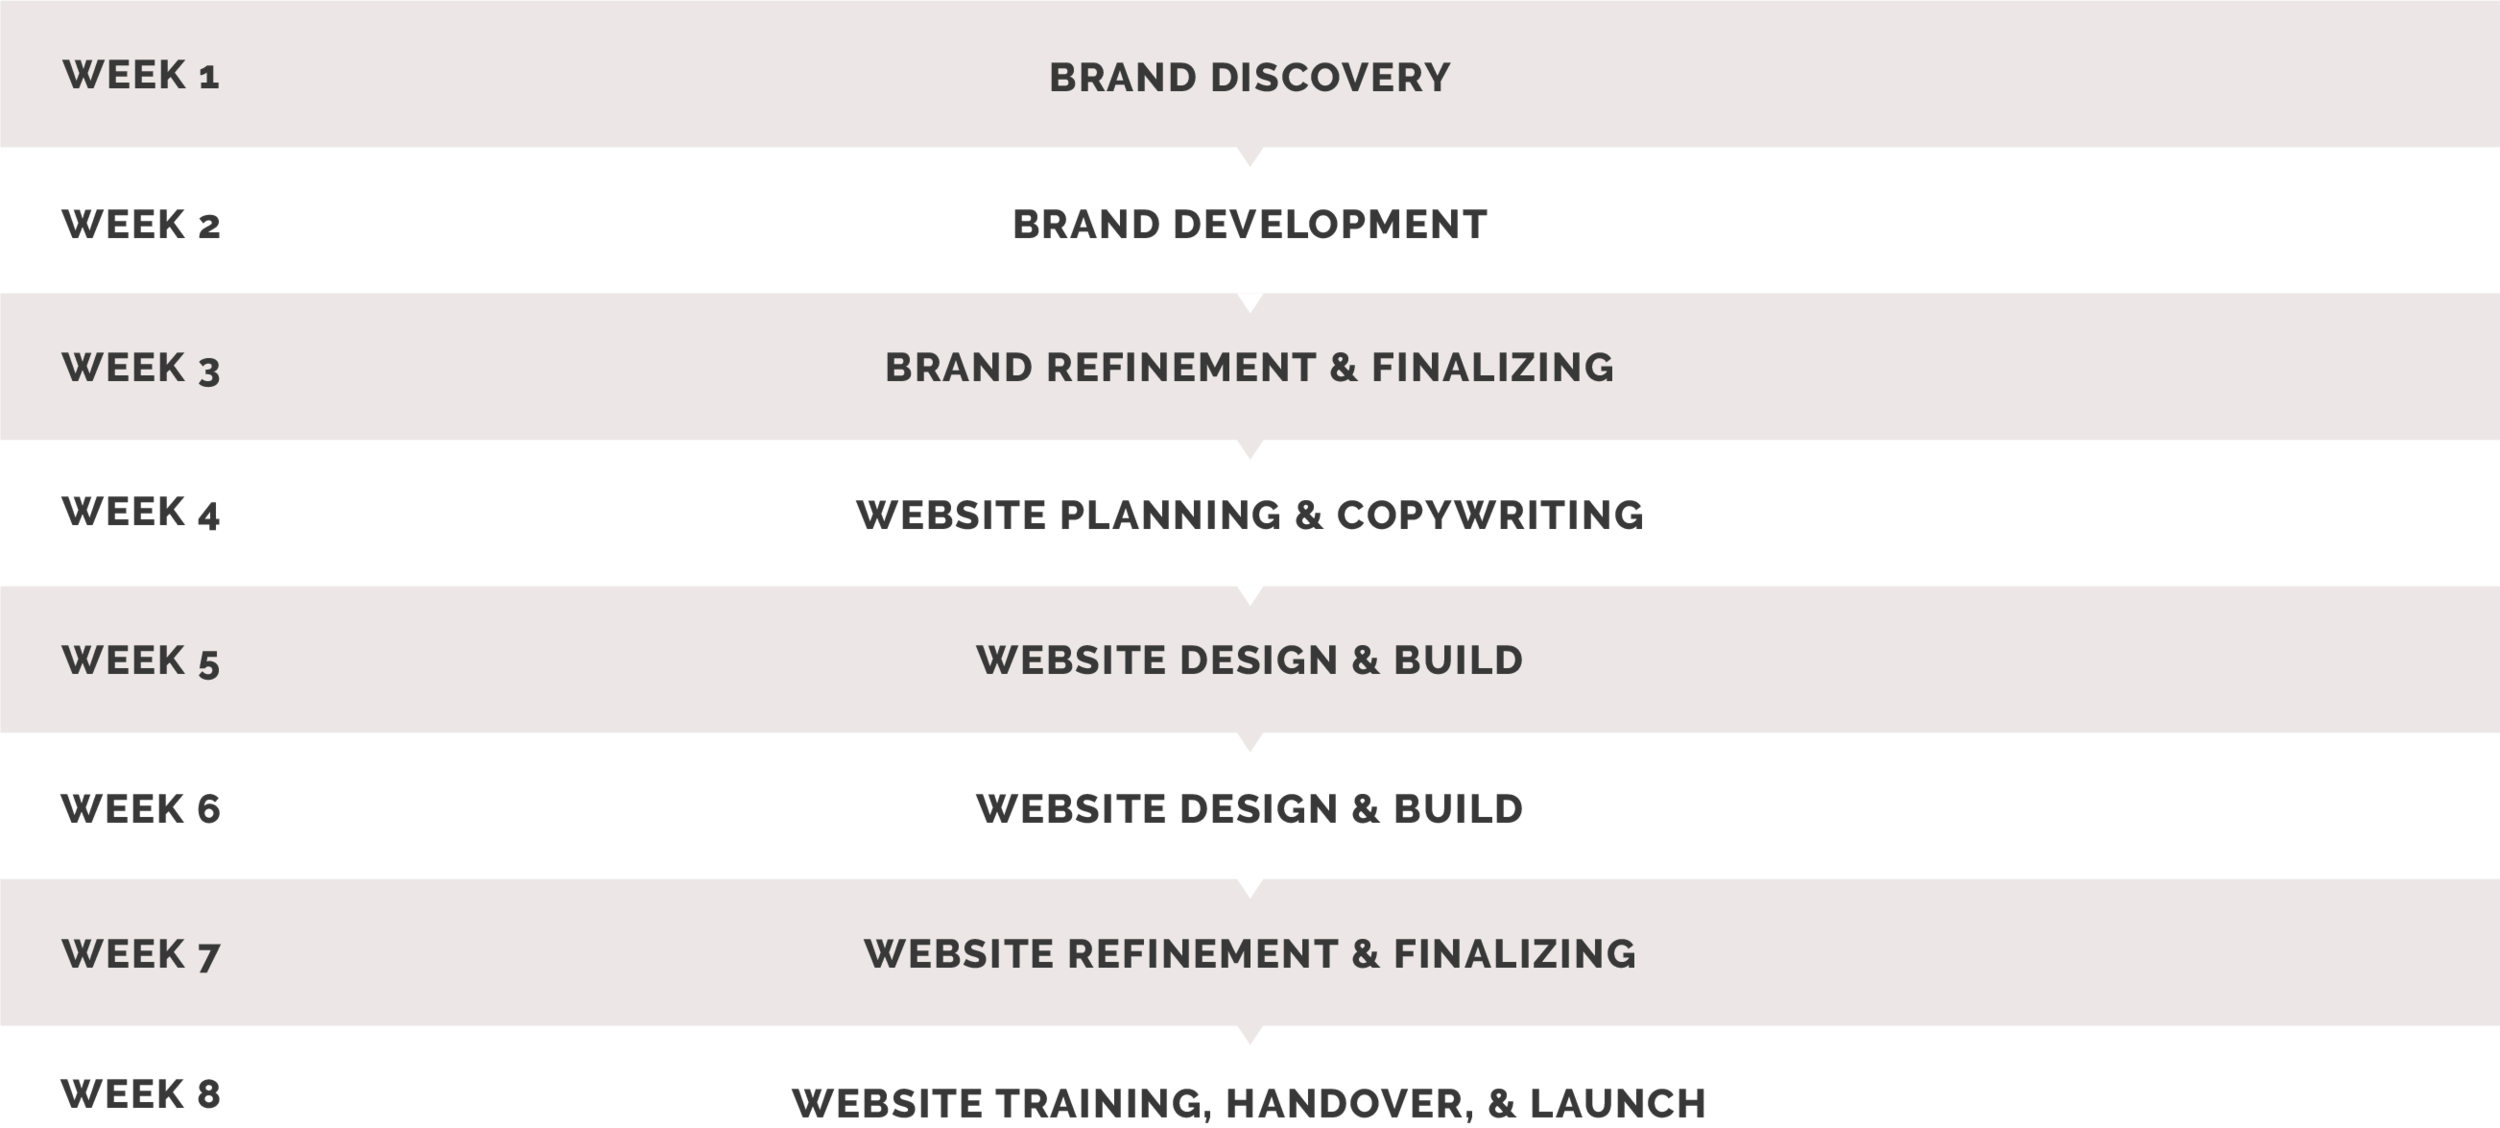 brandandwebdesigntimeline.png